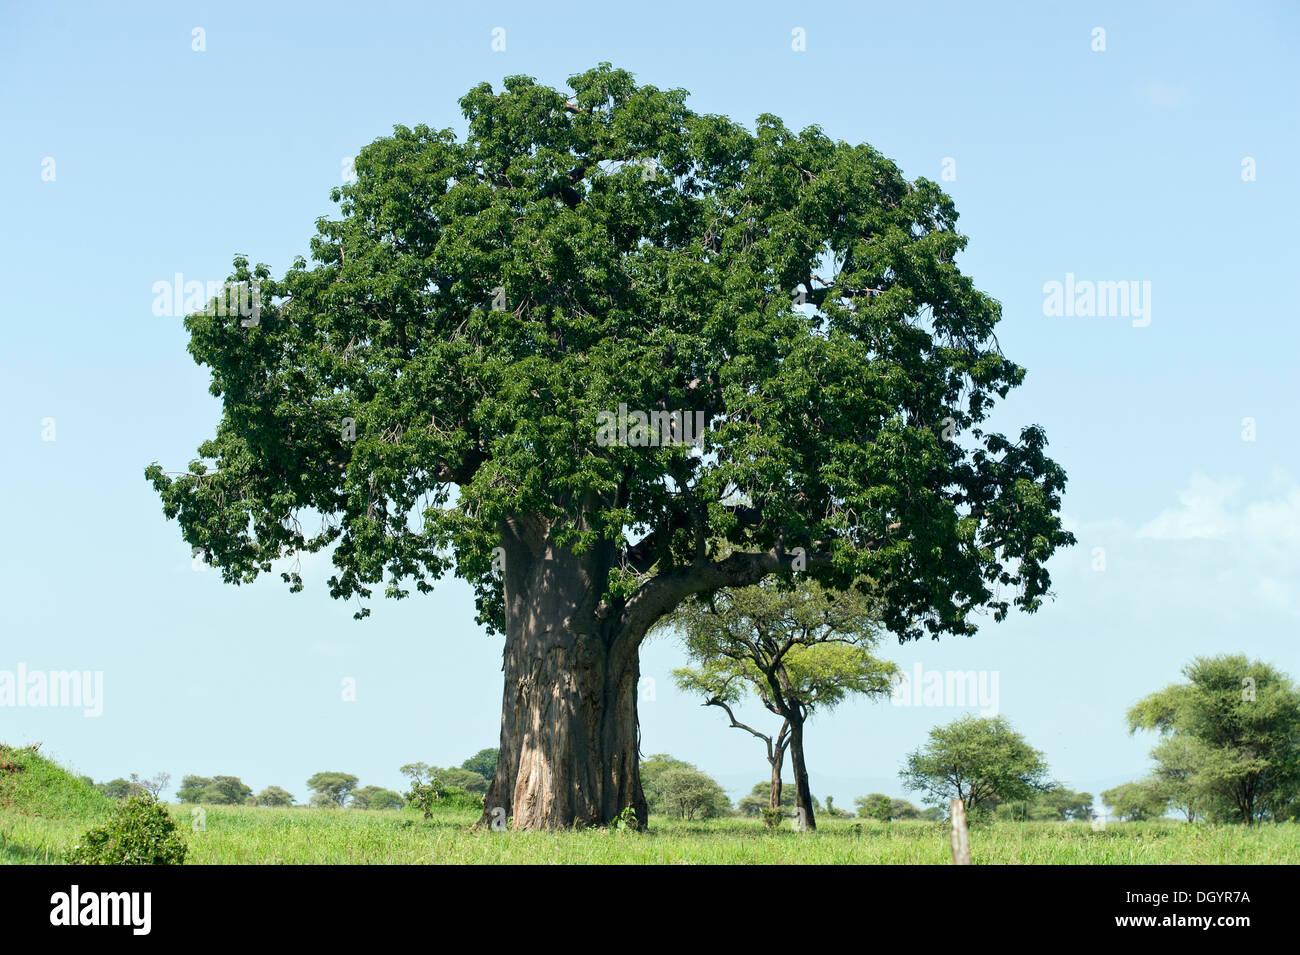 Baobab tree with leaves in Tarangire National Park, Tanzania - Stock Image